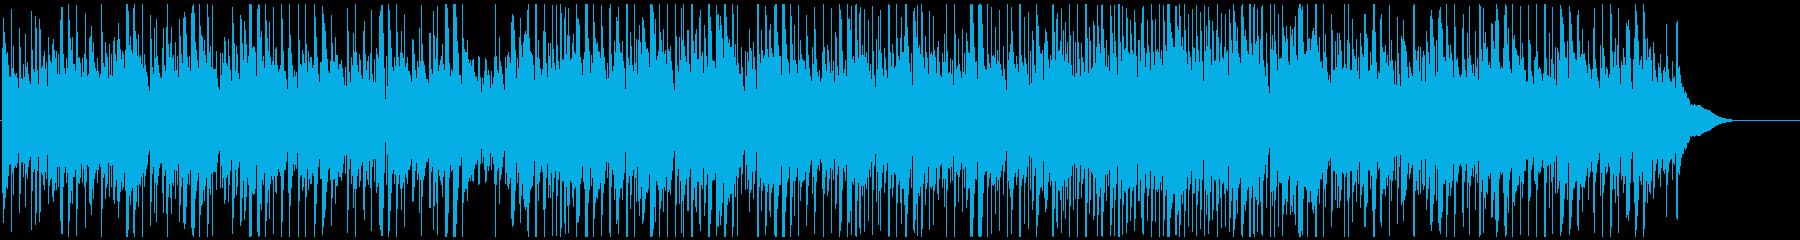 CMや映像にウクレレ 南国でのんびり像の再生済みの波形